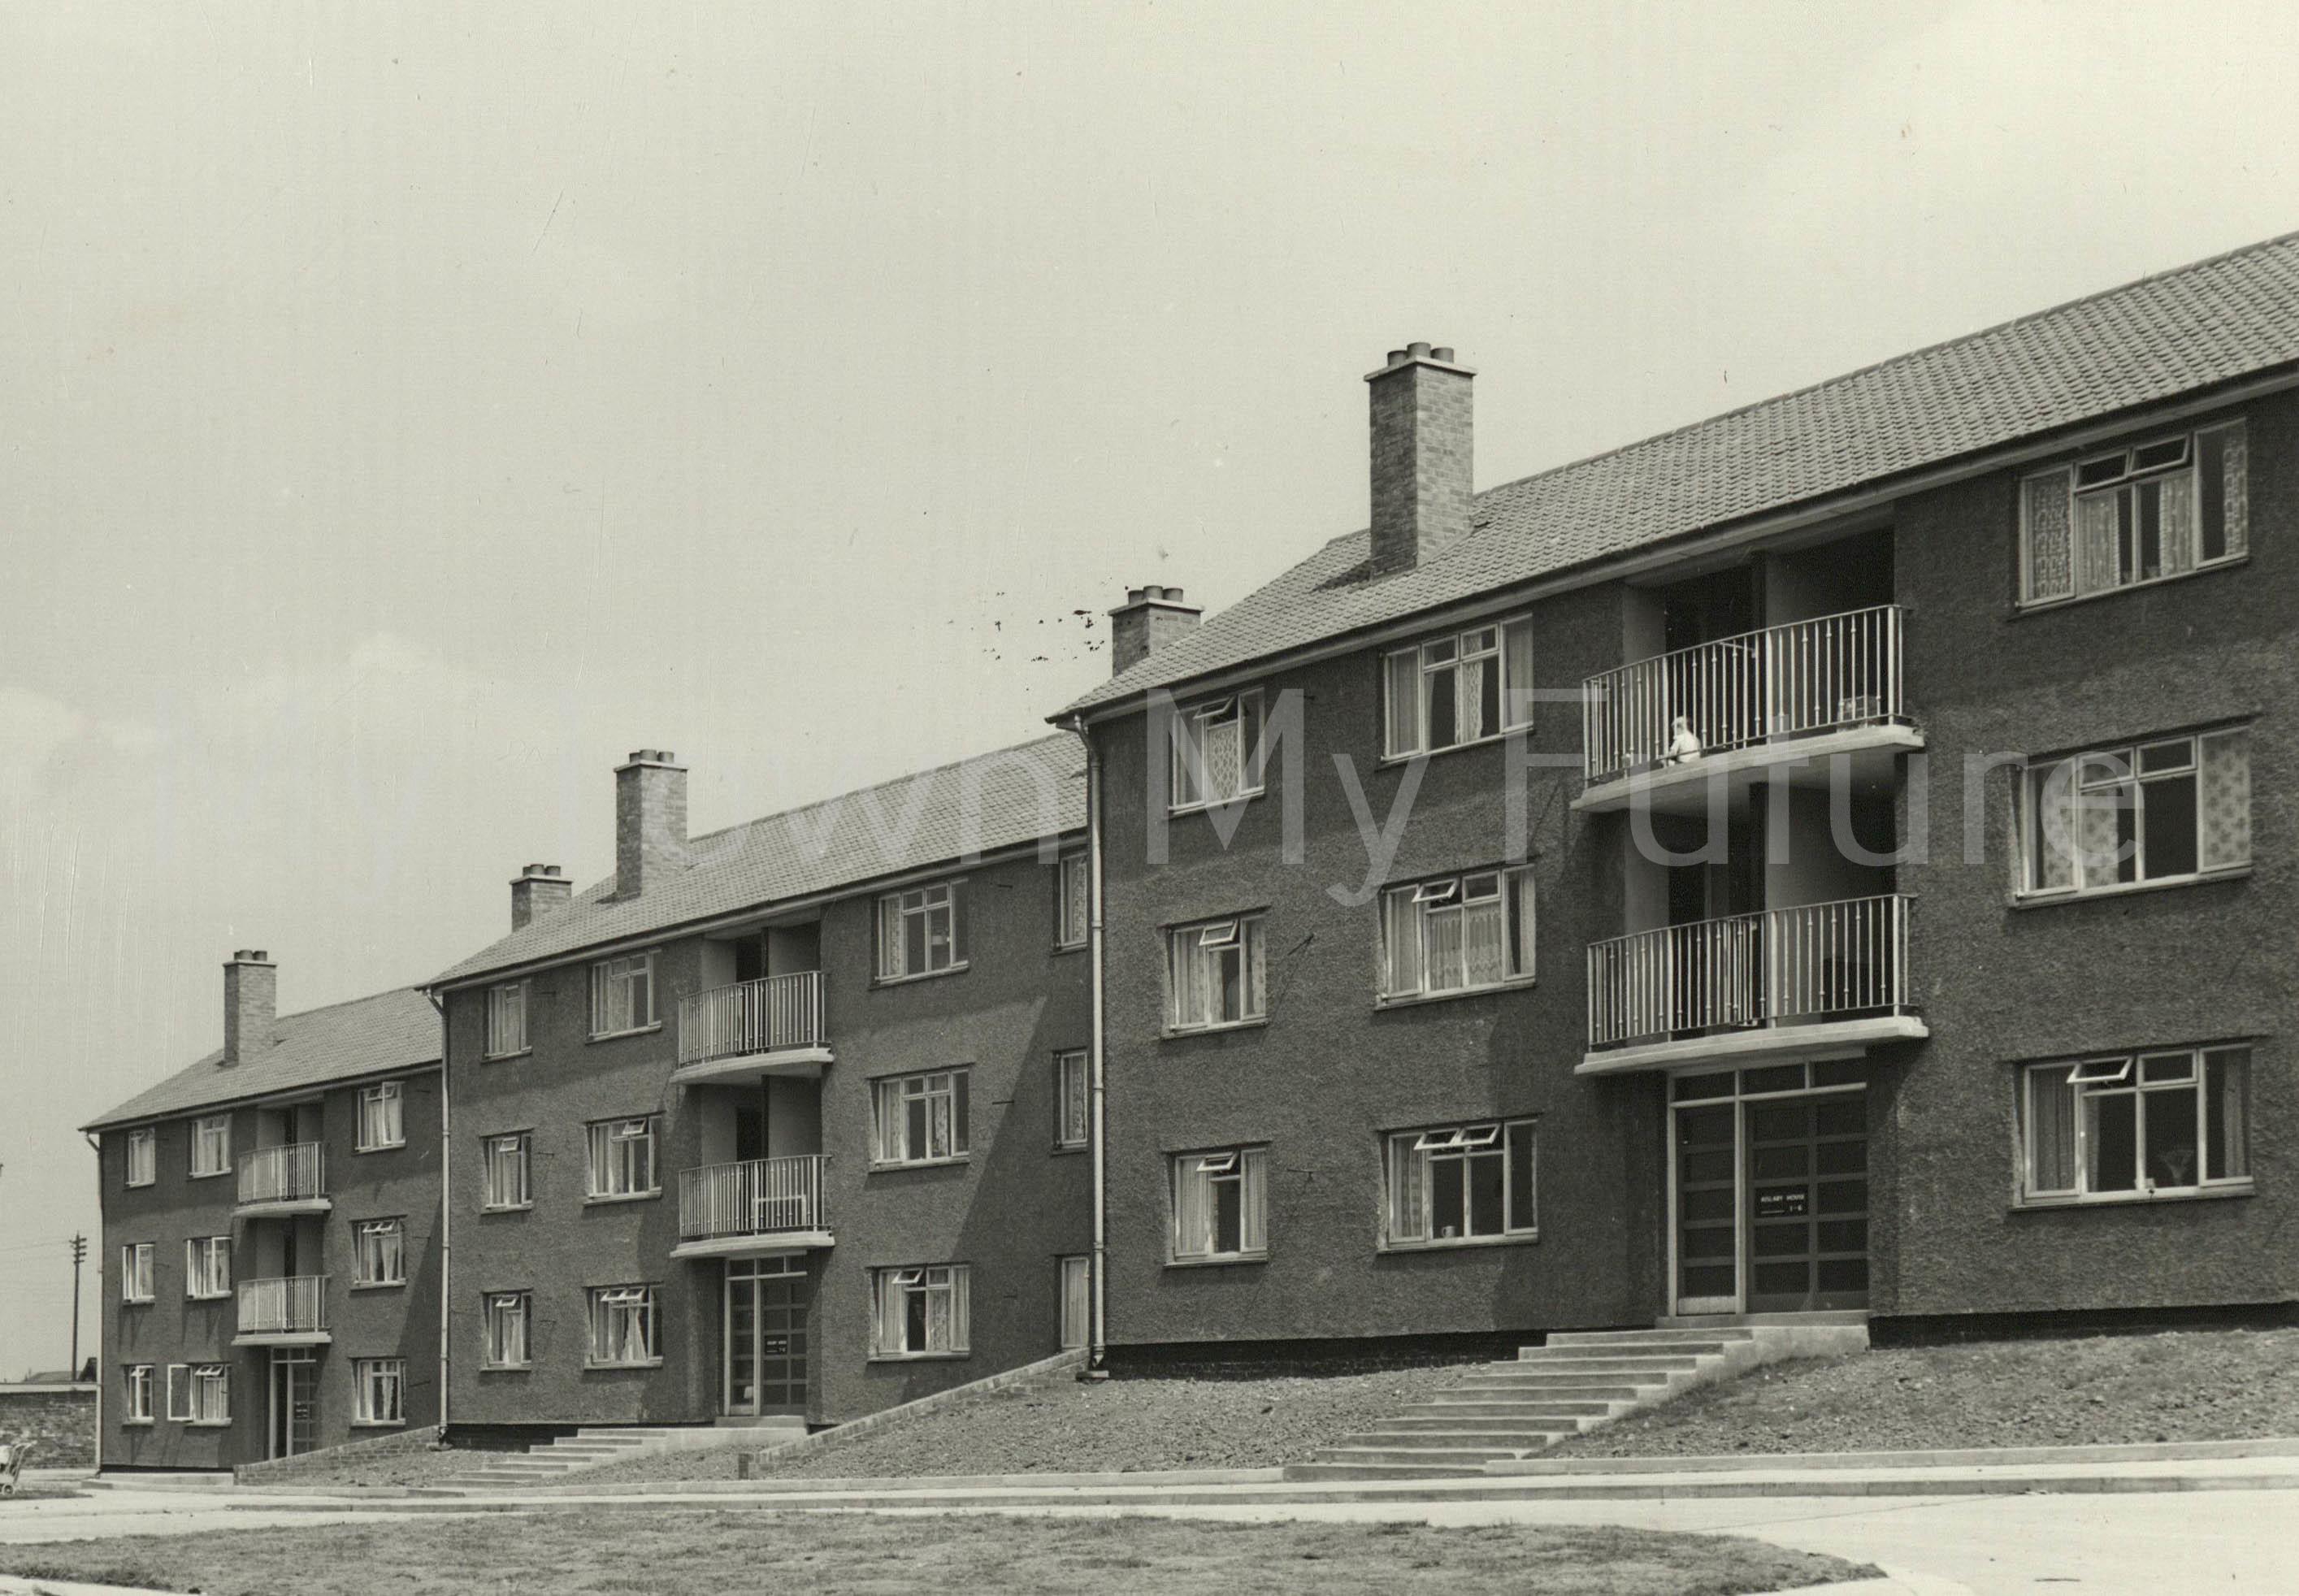 Stockton Street Flats